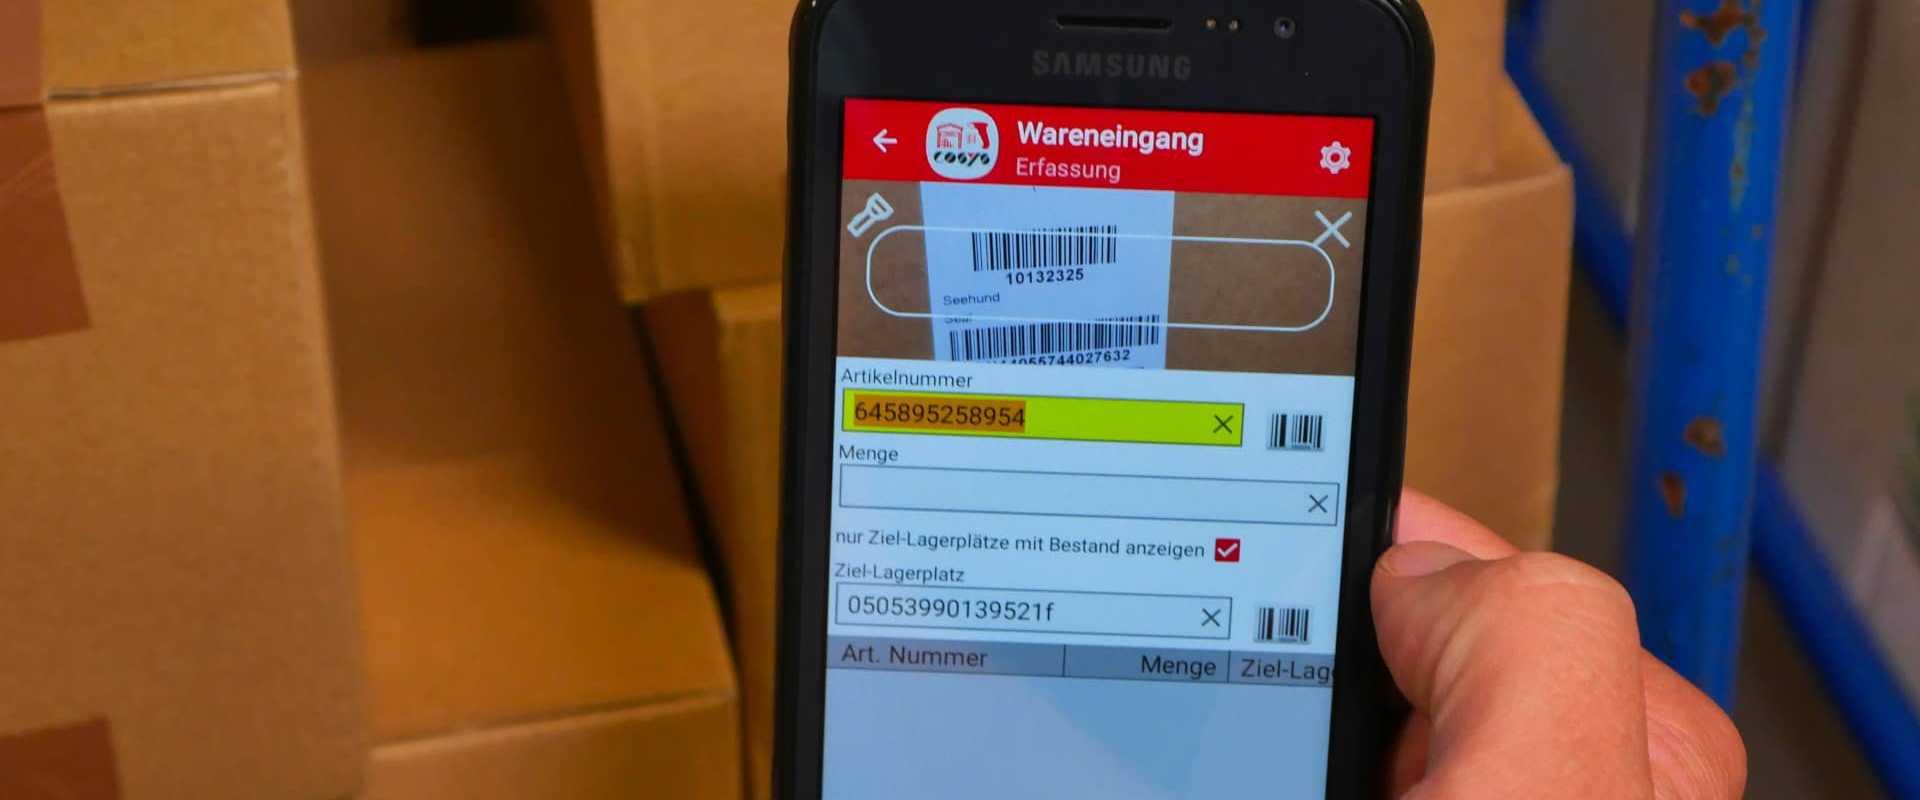 Warehouse Barcode Scanner App